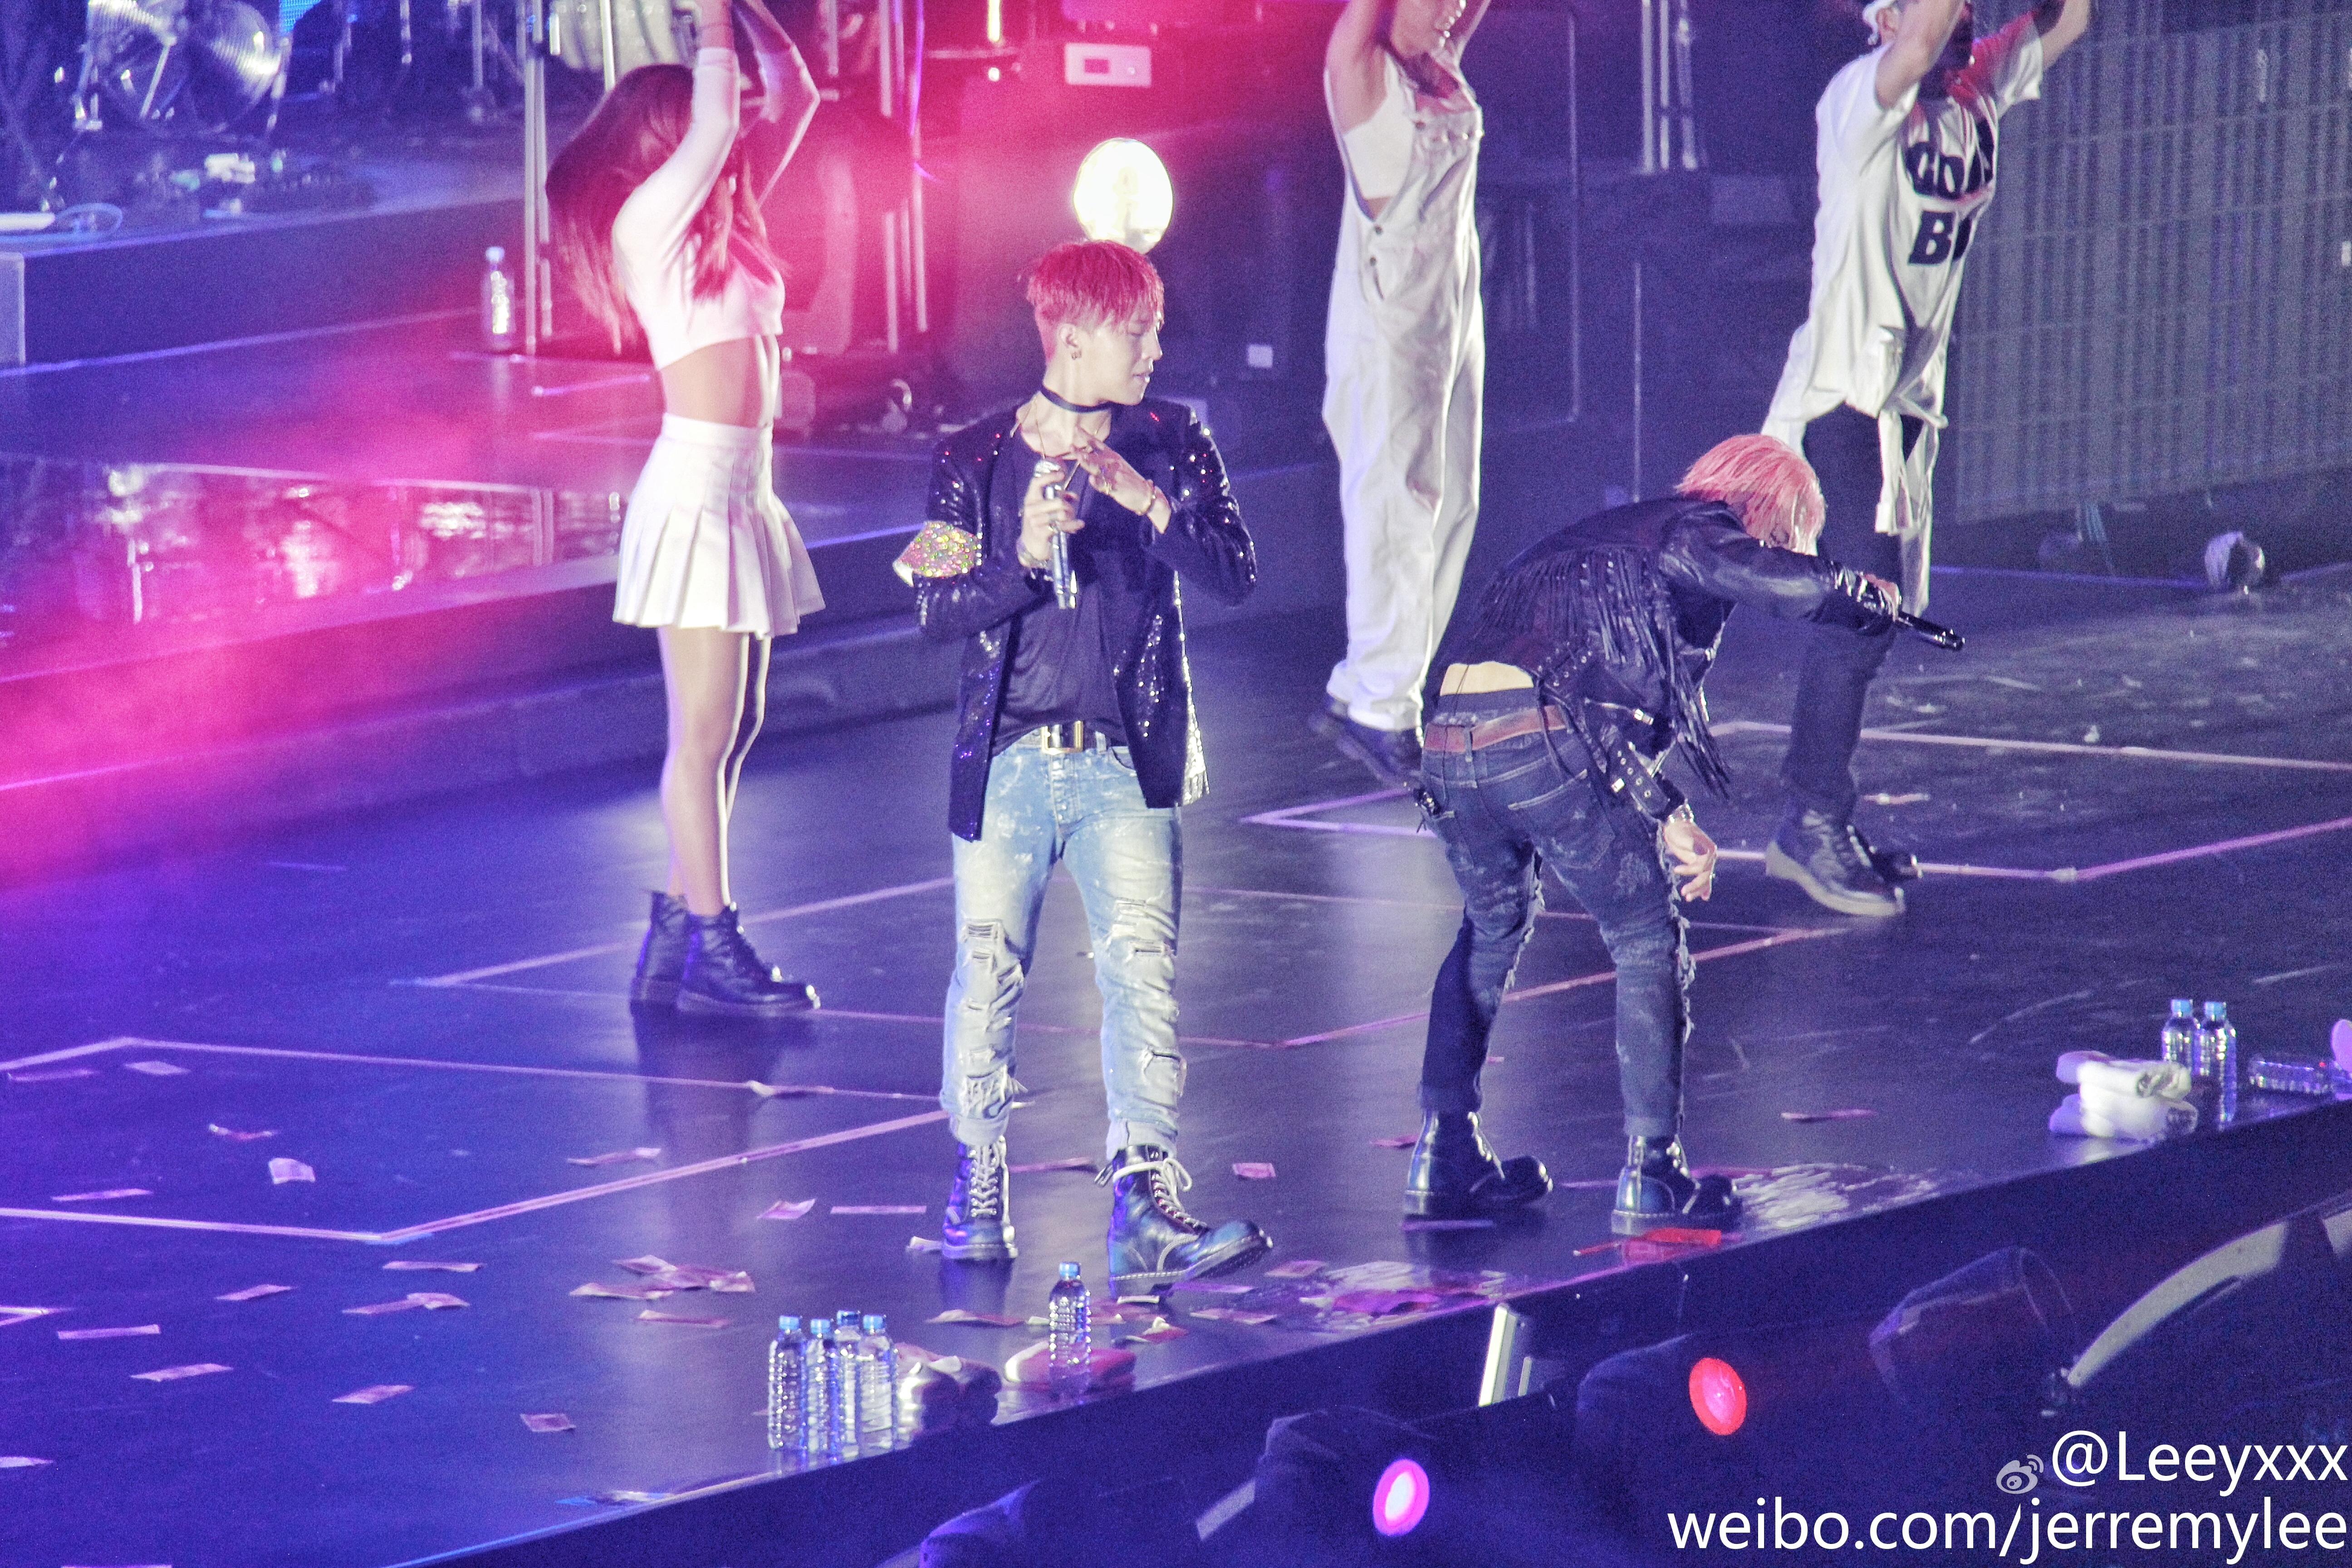 BIGBANG - Made Tour 2015 - Guangzhou - 30may2015 - jerremylee - 03.jpg